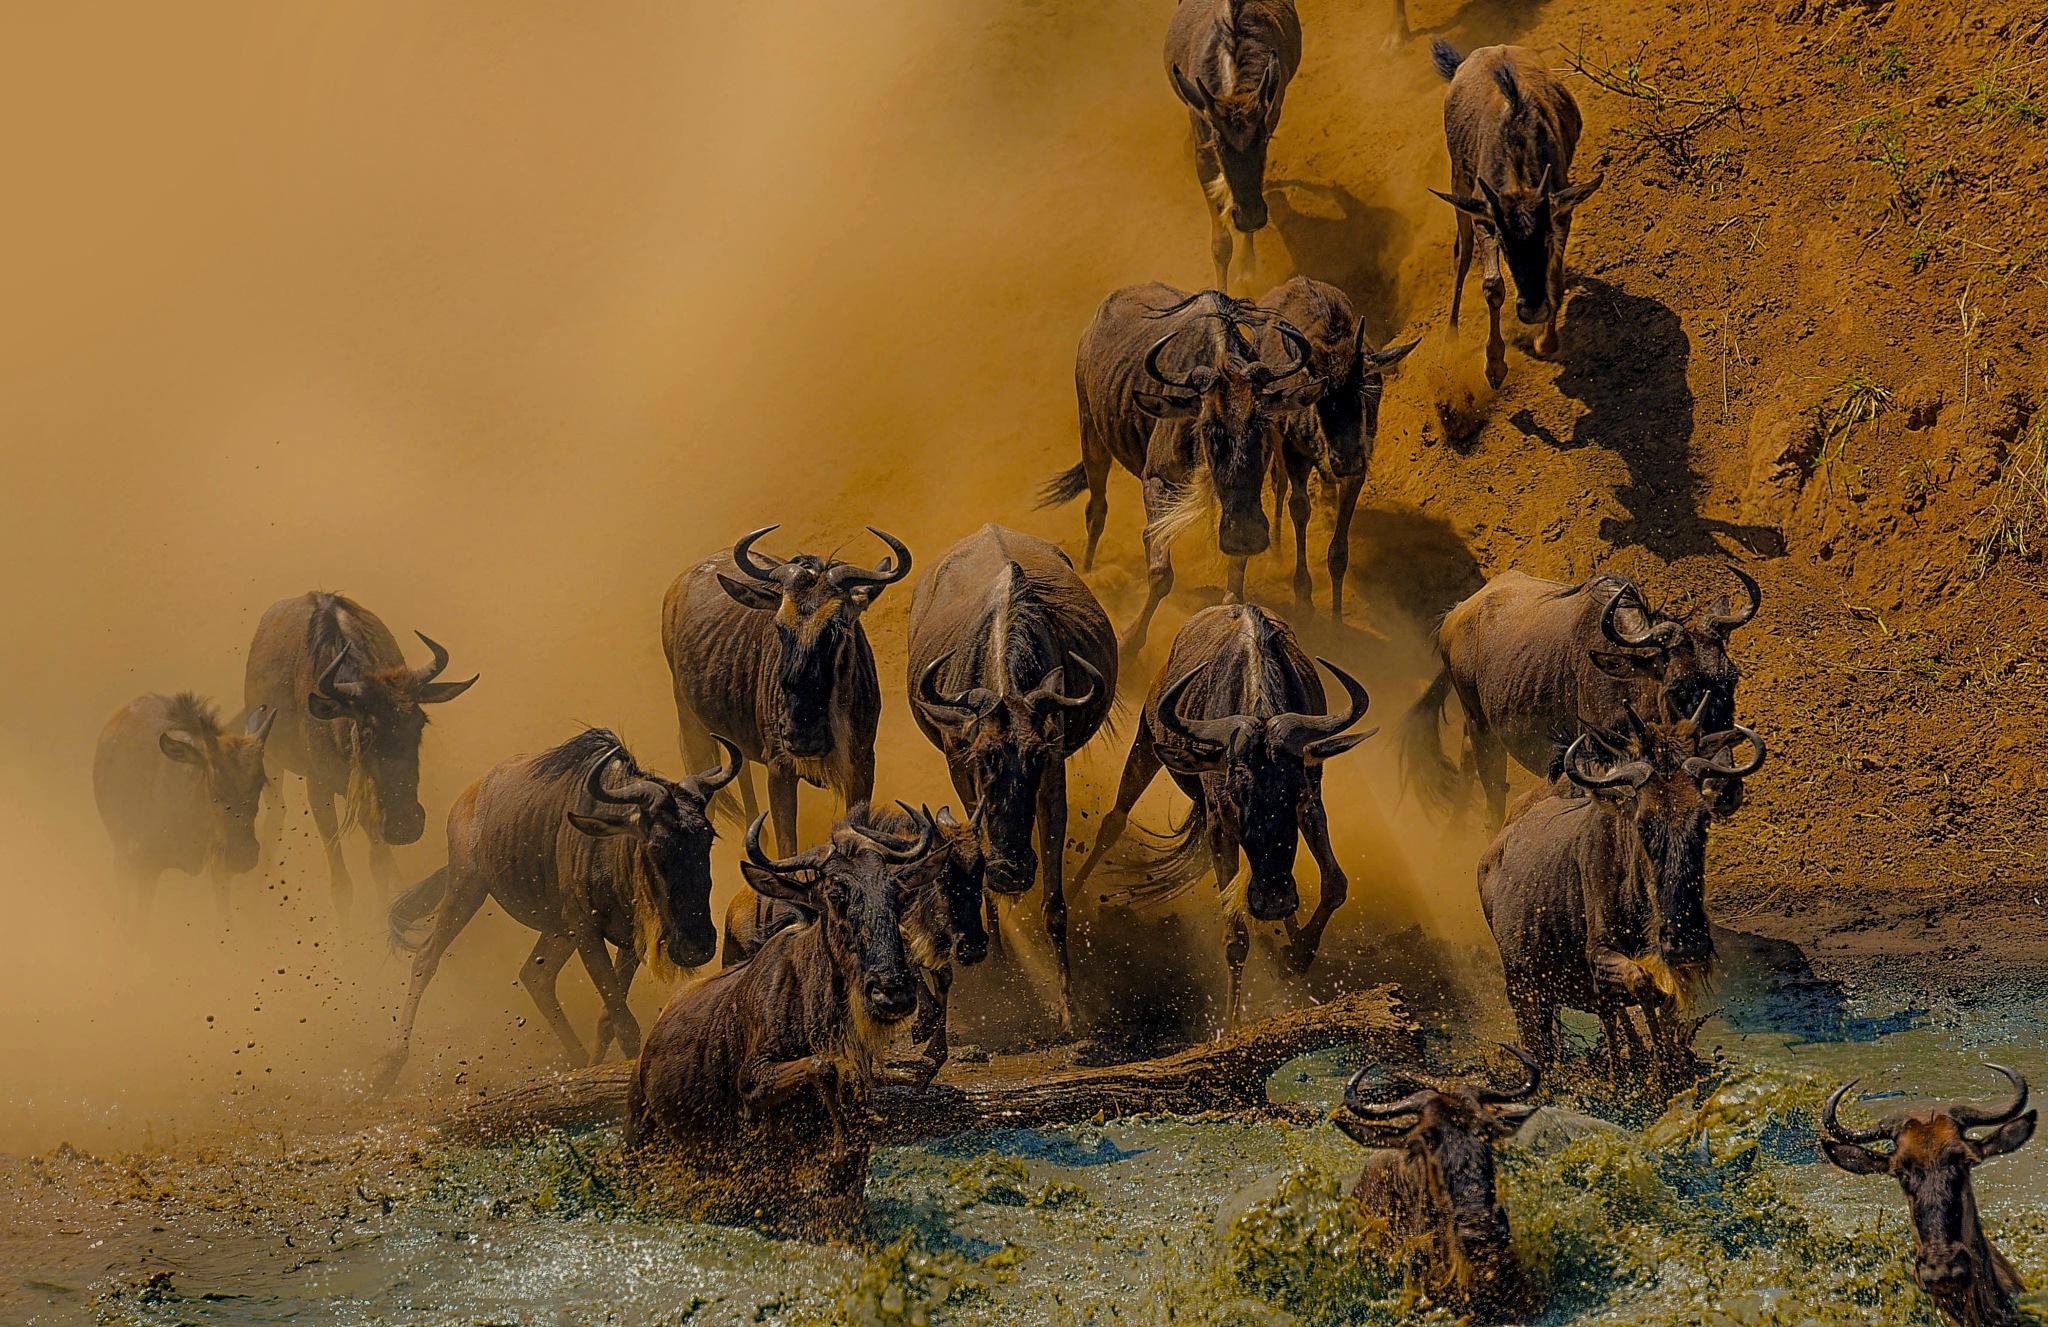 Crossing the river. mara river - great migration - Kenya  by Ibrahim.Najjar